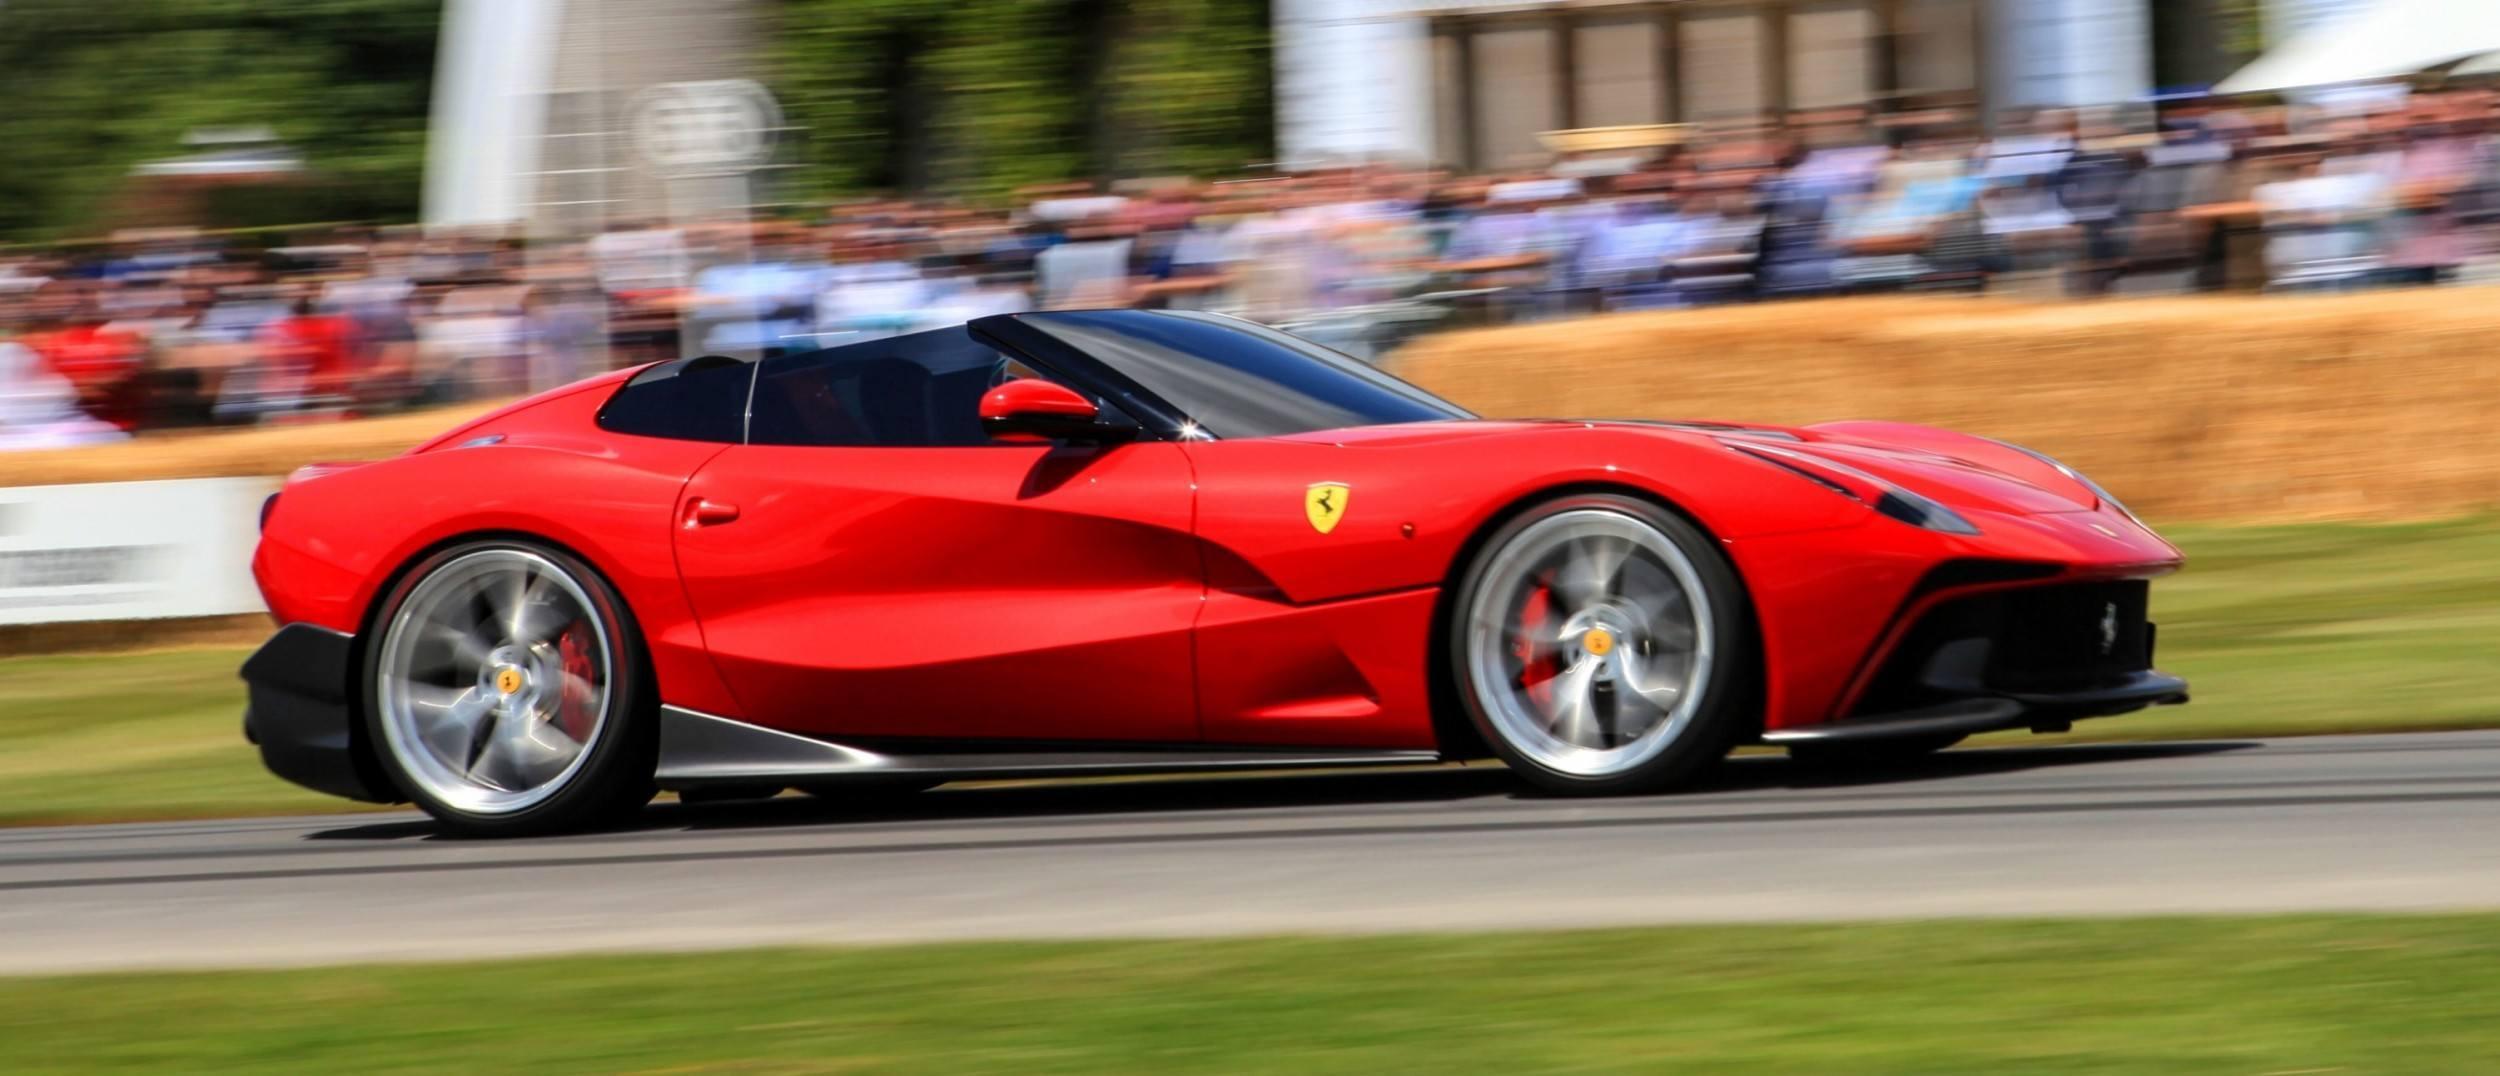 31s 2015 Ferrari F60 America Is 10 Copy F12 Spyder